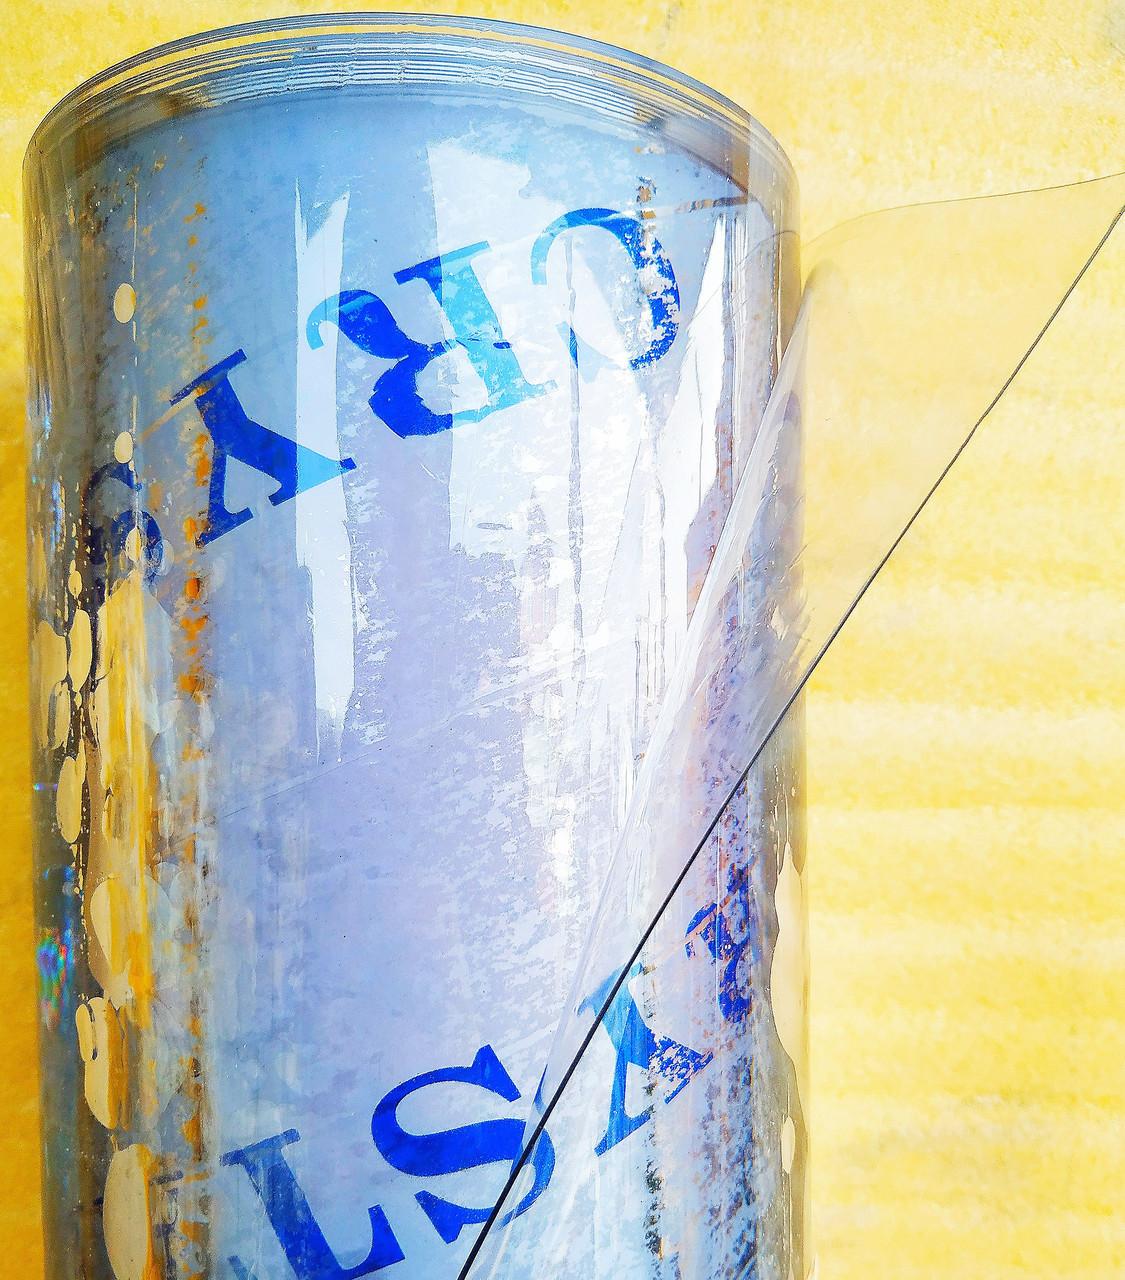 "Пленка ПВХ Мягкое стекло. 1200мкм плотность\Рулон 15м. Ширина 1.40м. Прозрачная.""Crystal"""